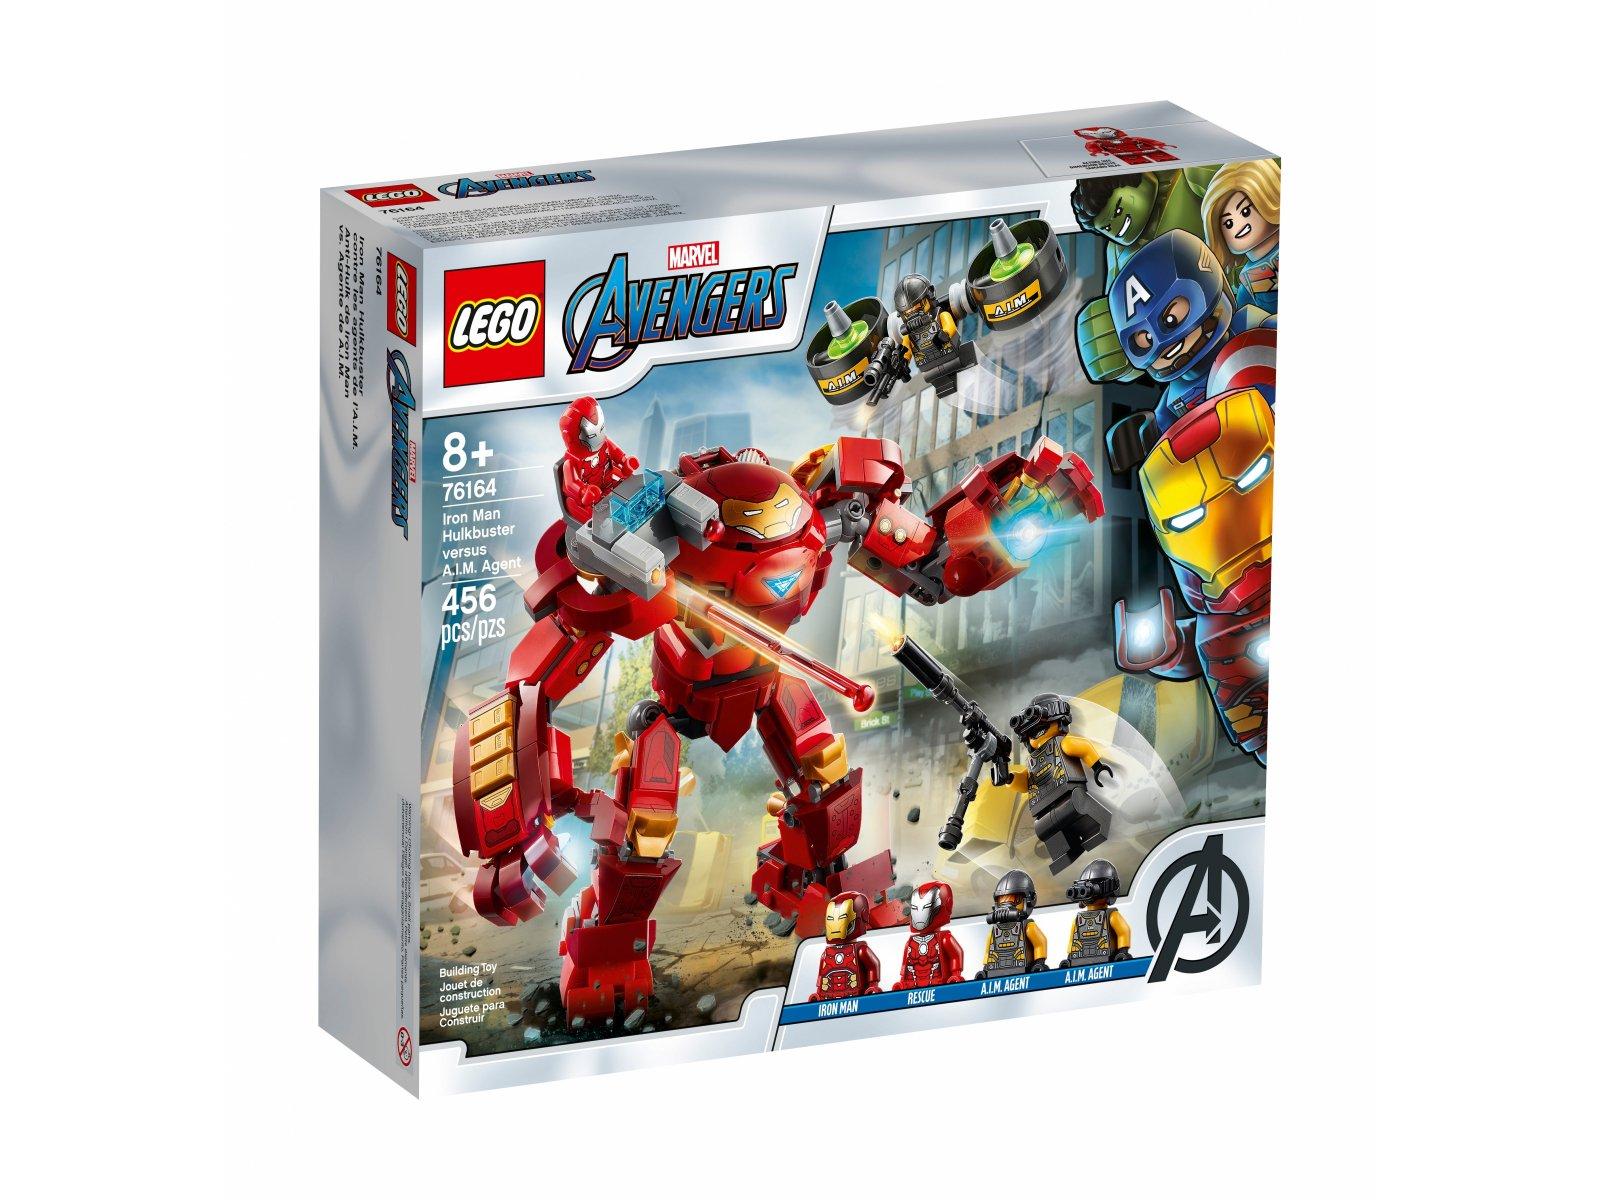 LEGO Marvel Avengers Hulkbuster Iron Mana kontra agenci A.I.M. 76164